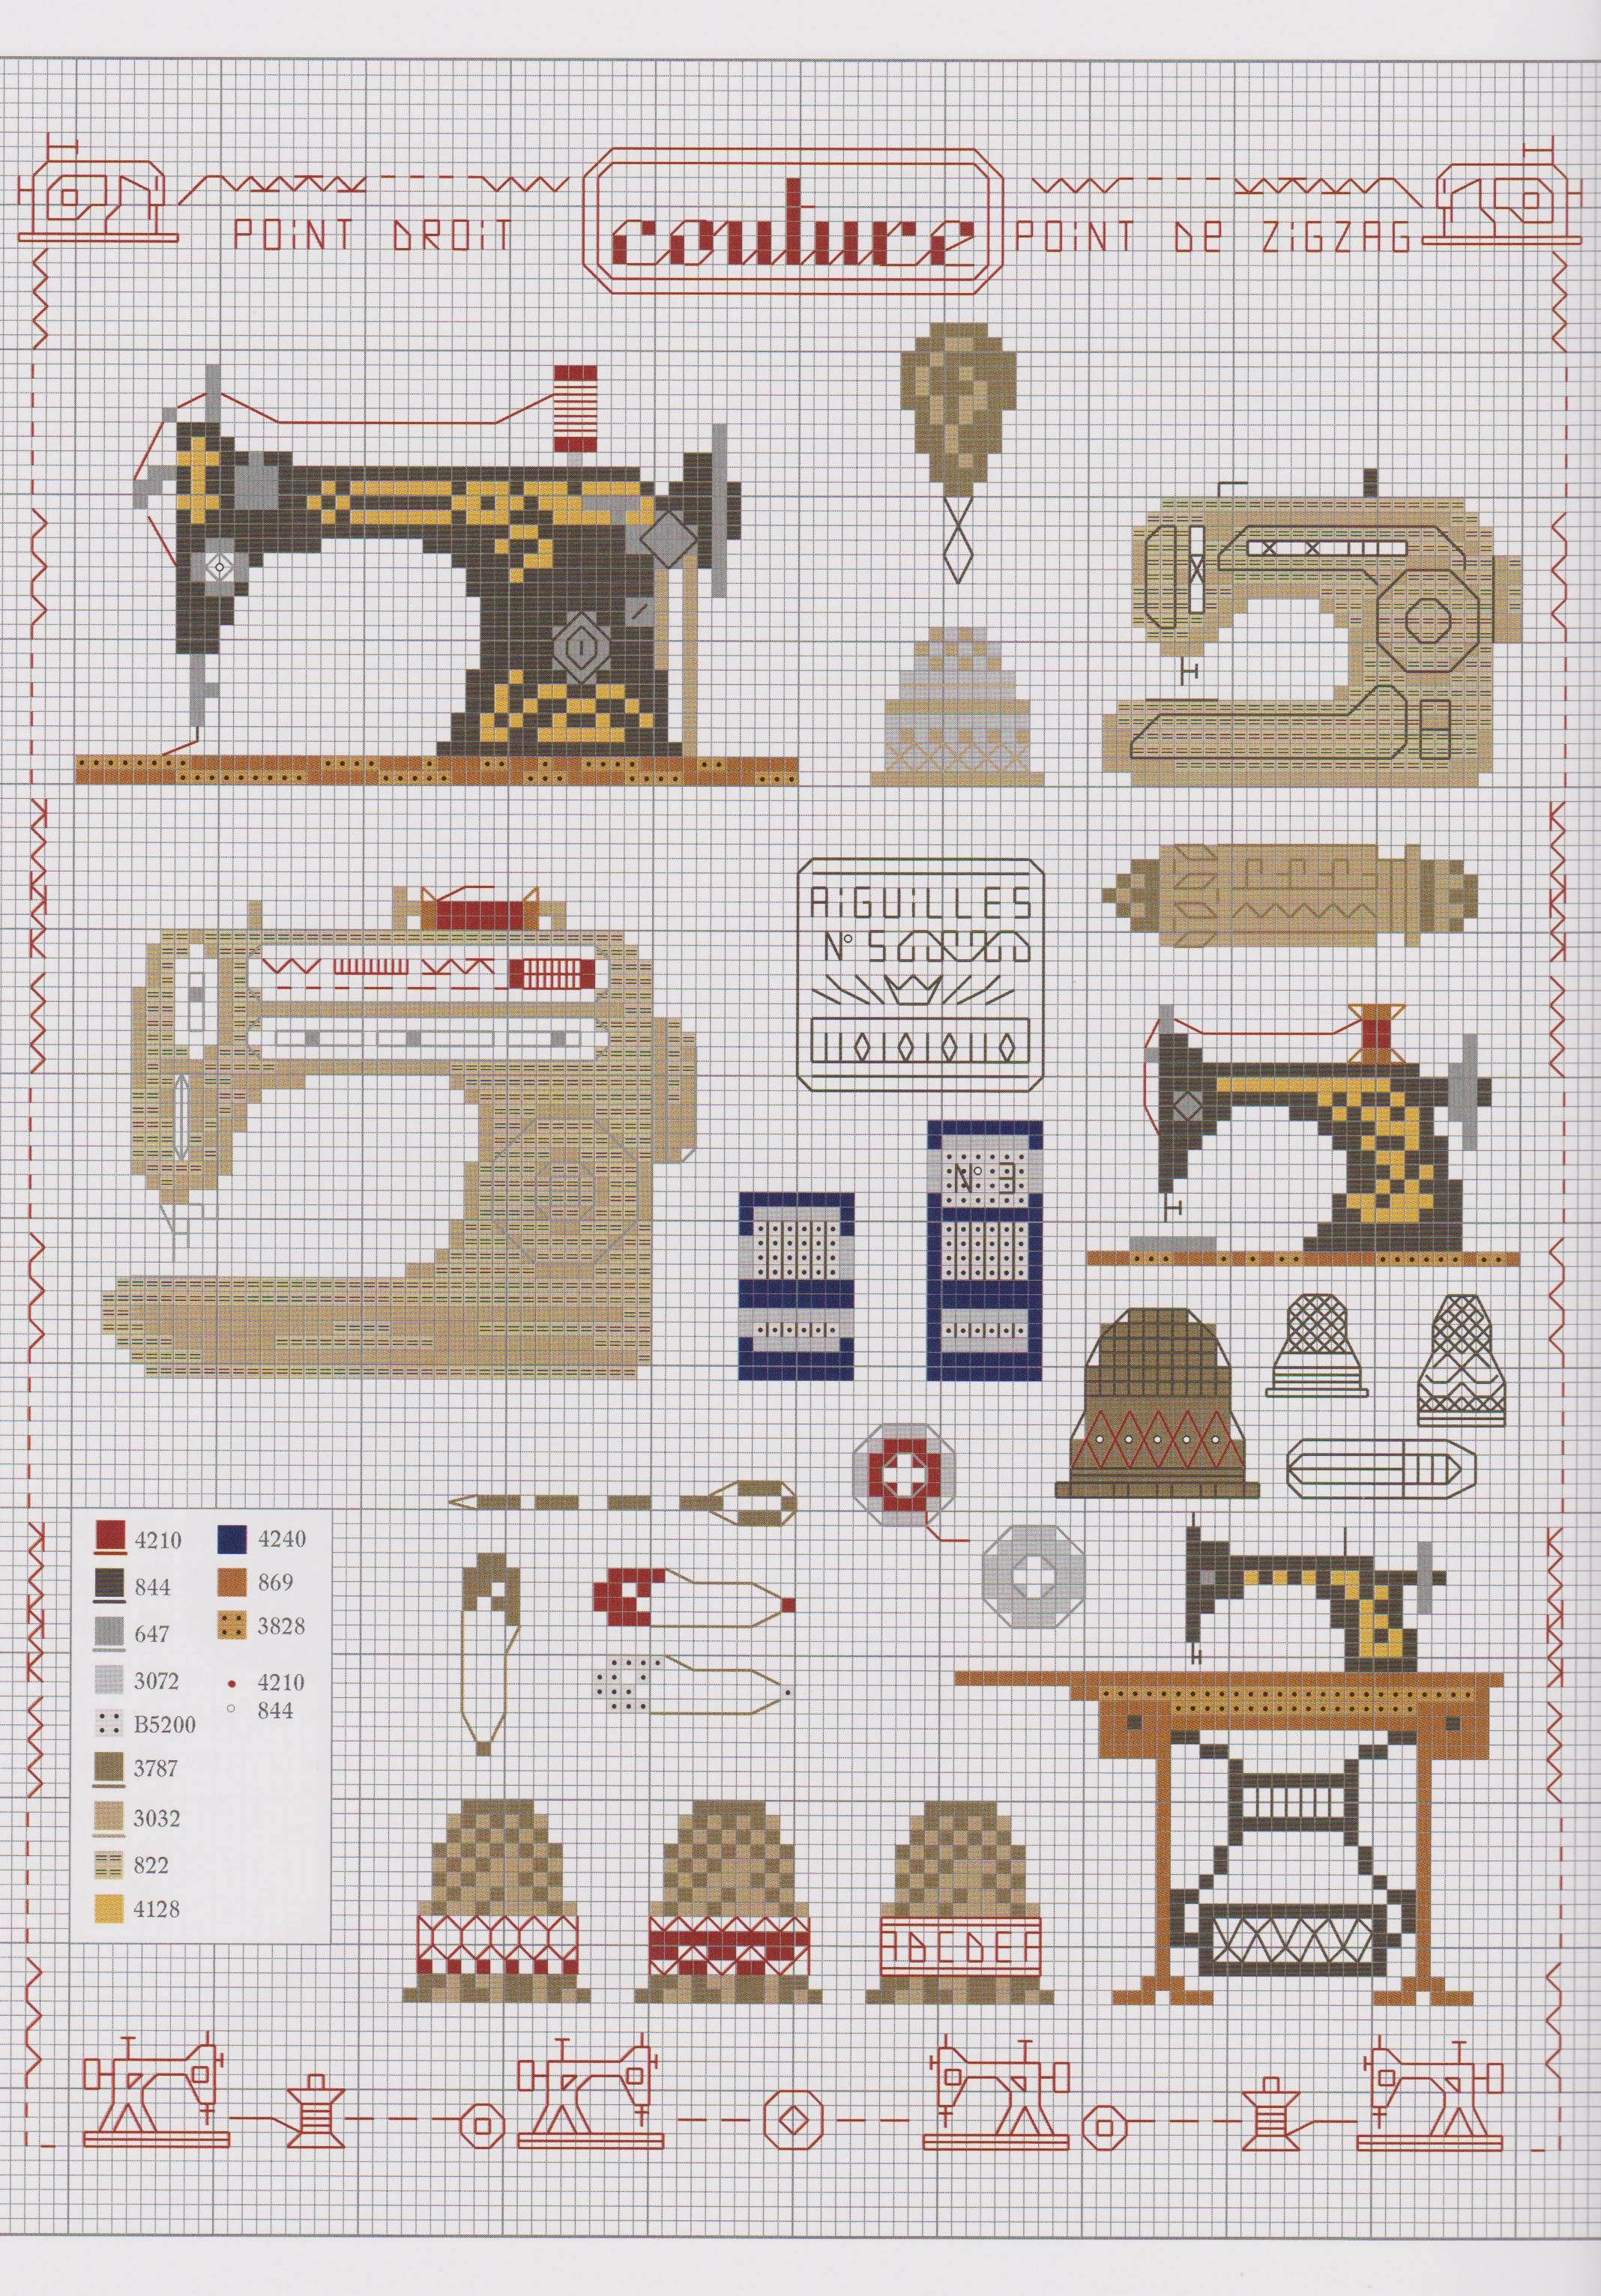 Sewing cross stitch | borduren | Pinterest | Punto de cruz, Puntos y ...